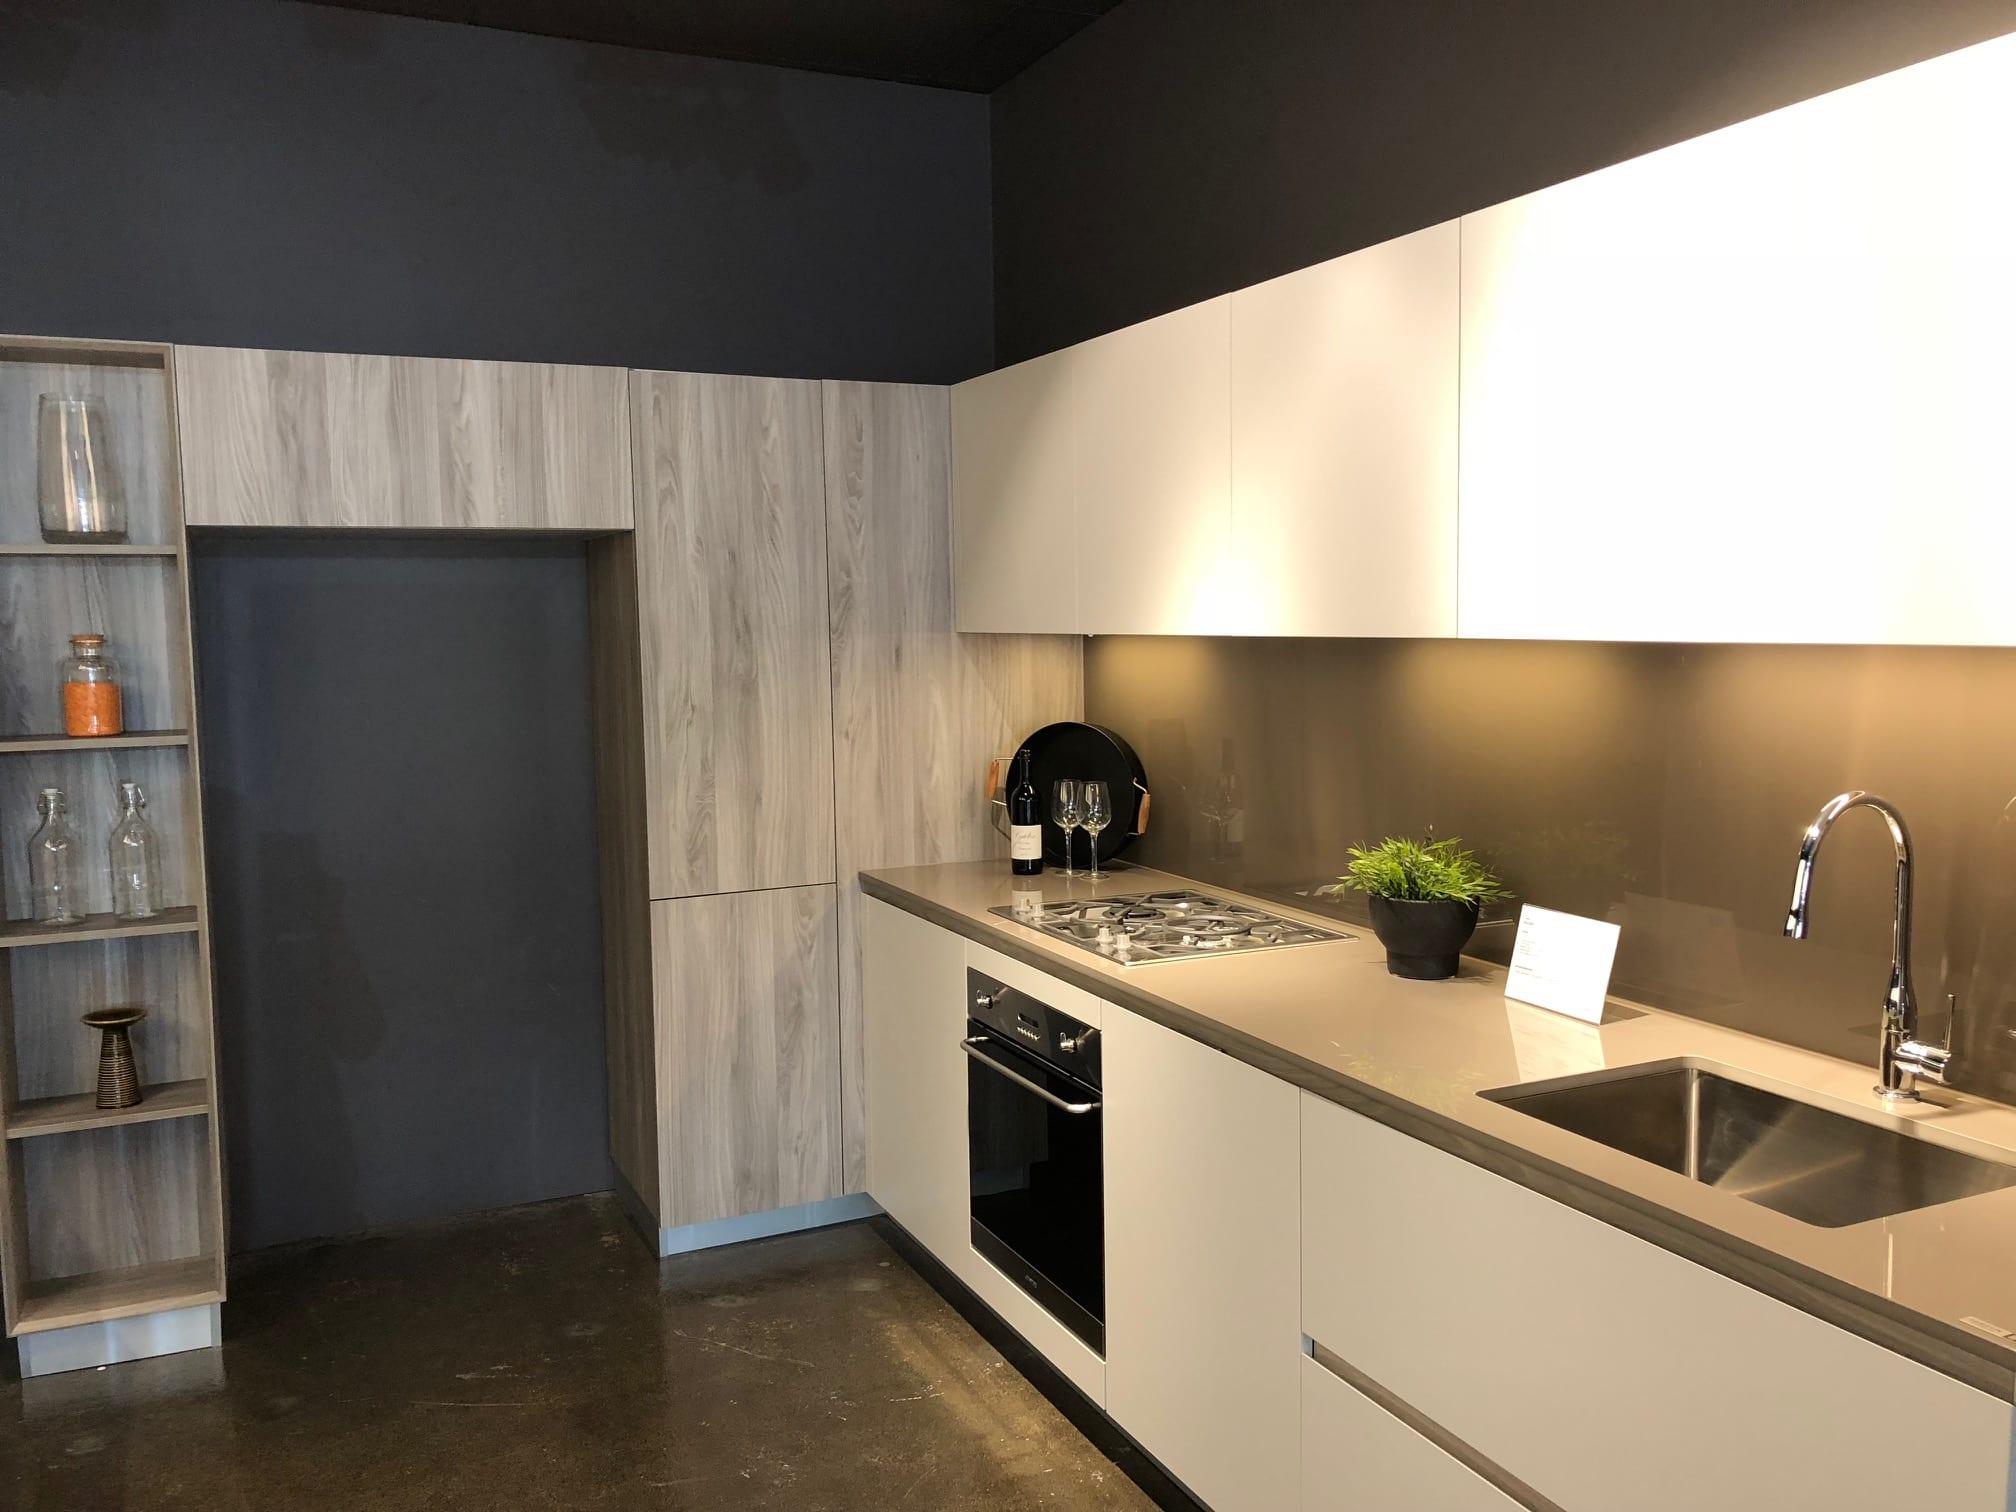 Ex Display Kitchens European Kitchen Group